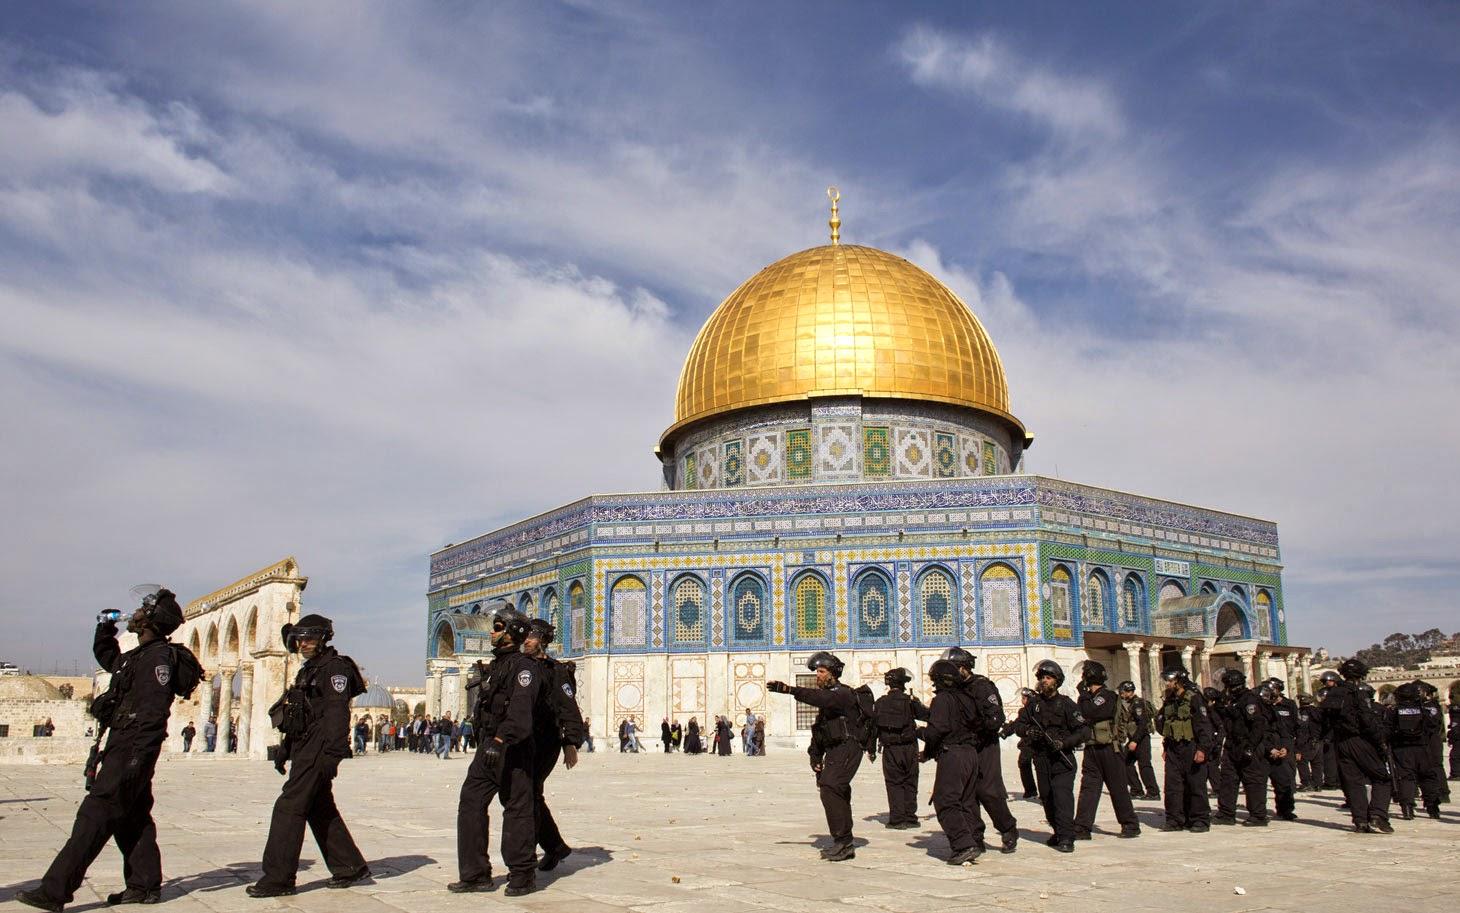 masjid al aqsa hd wallpapers 2015 snipping world